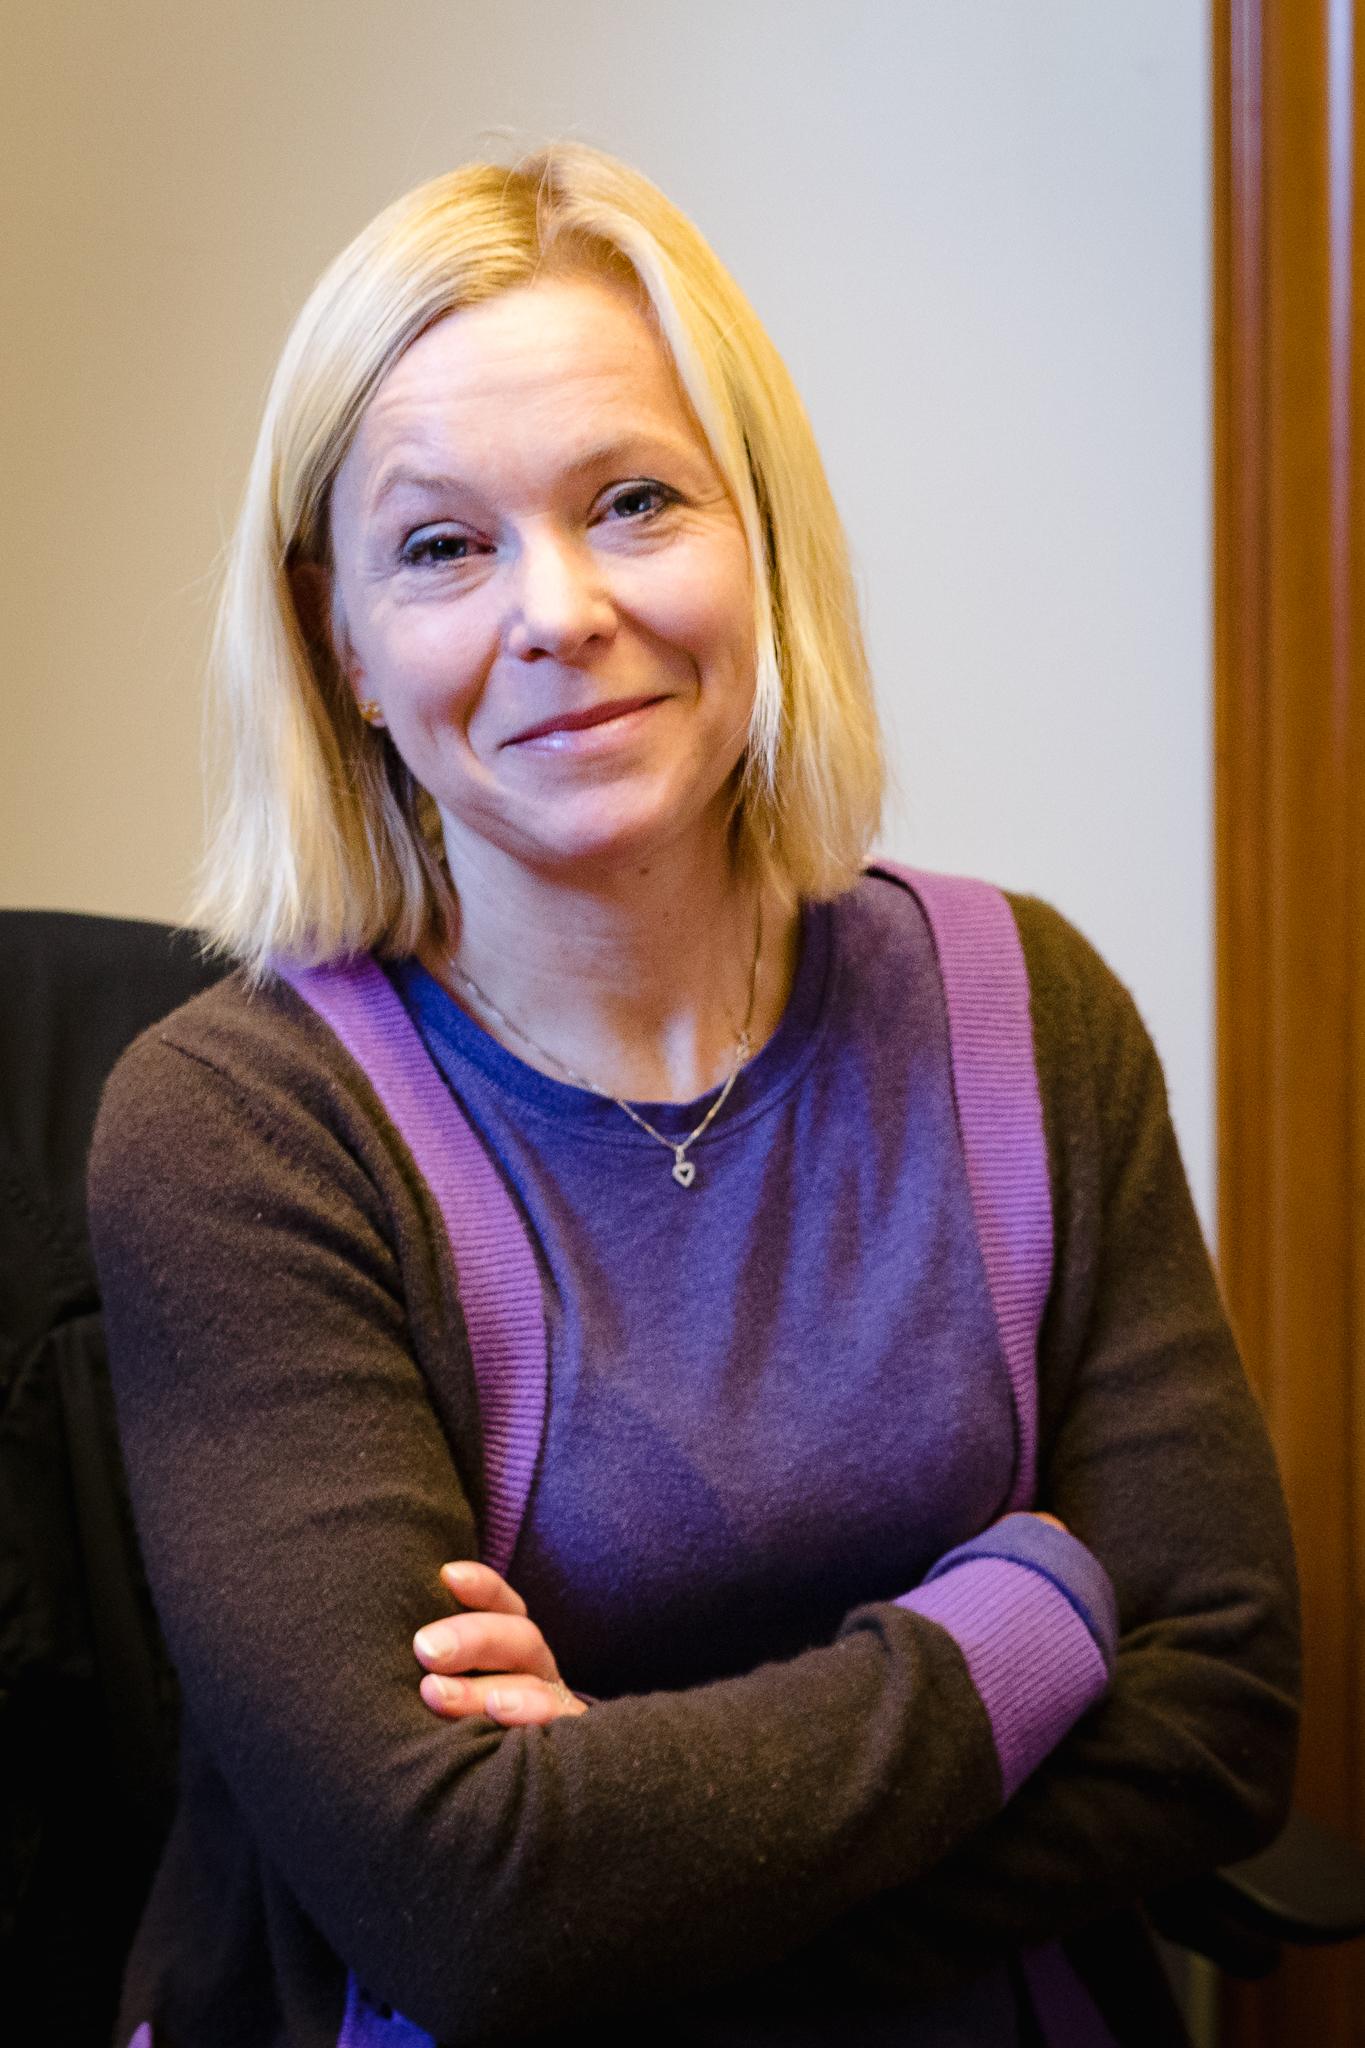 International Professor Profile: Anna Bjurman-Pautz